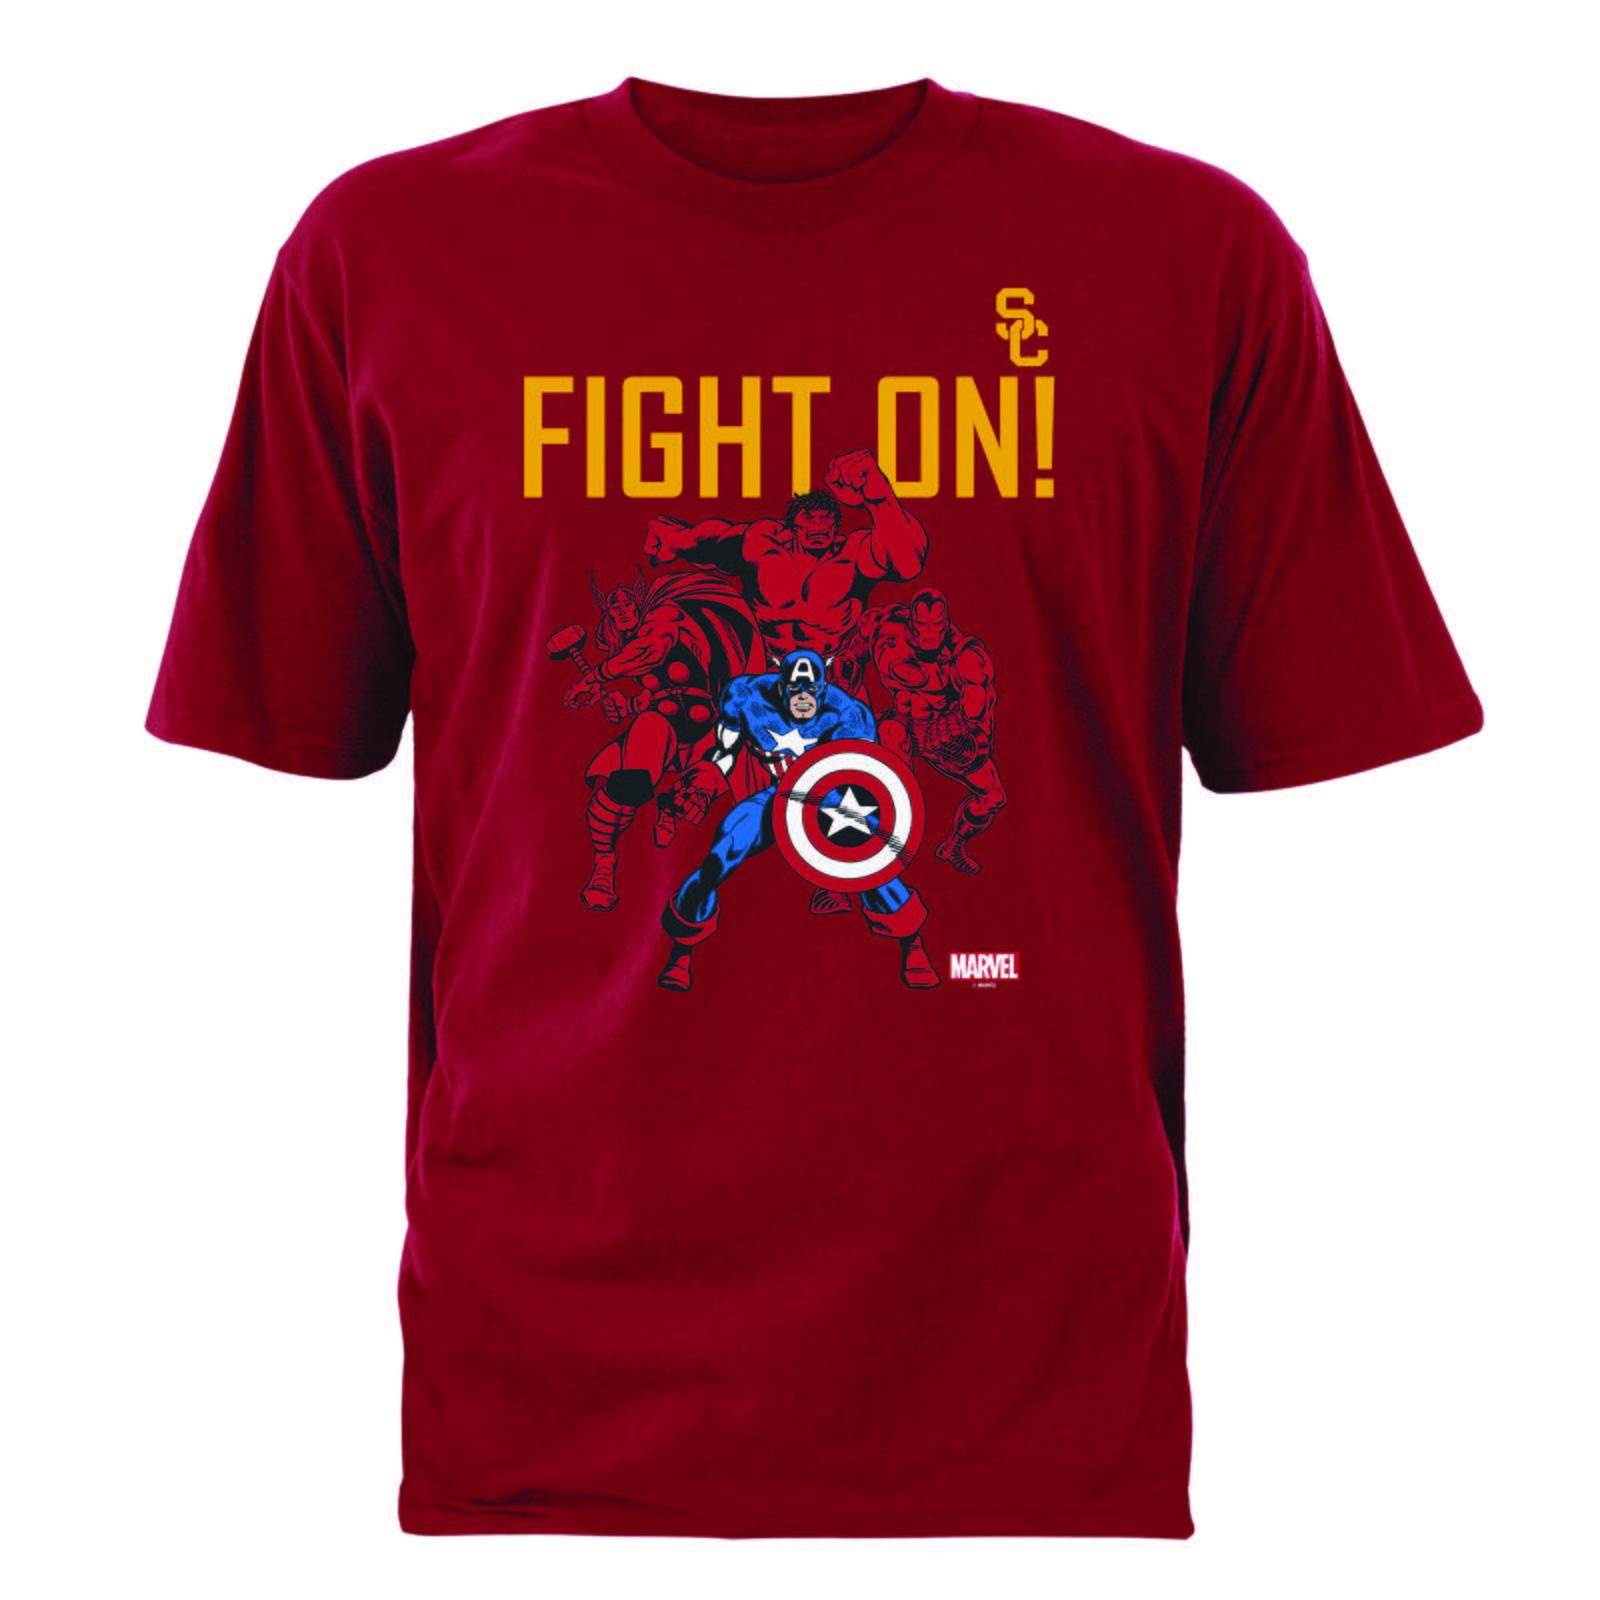 bec30bf7248 USC Trojans X Marvel Fight On Avengers T-shirt